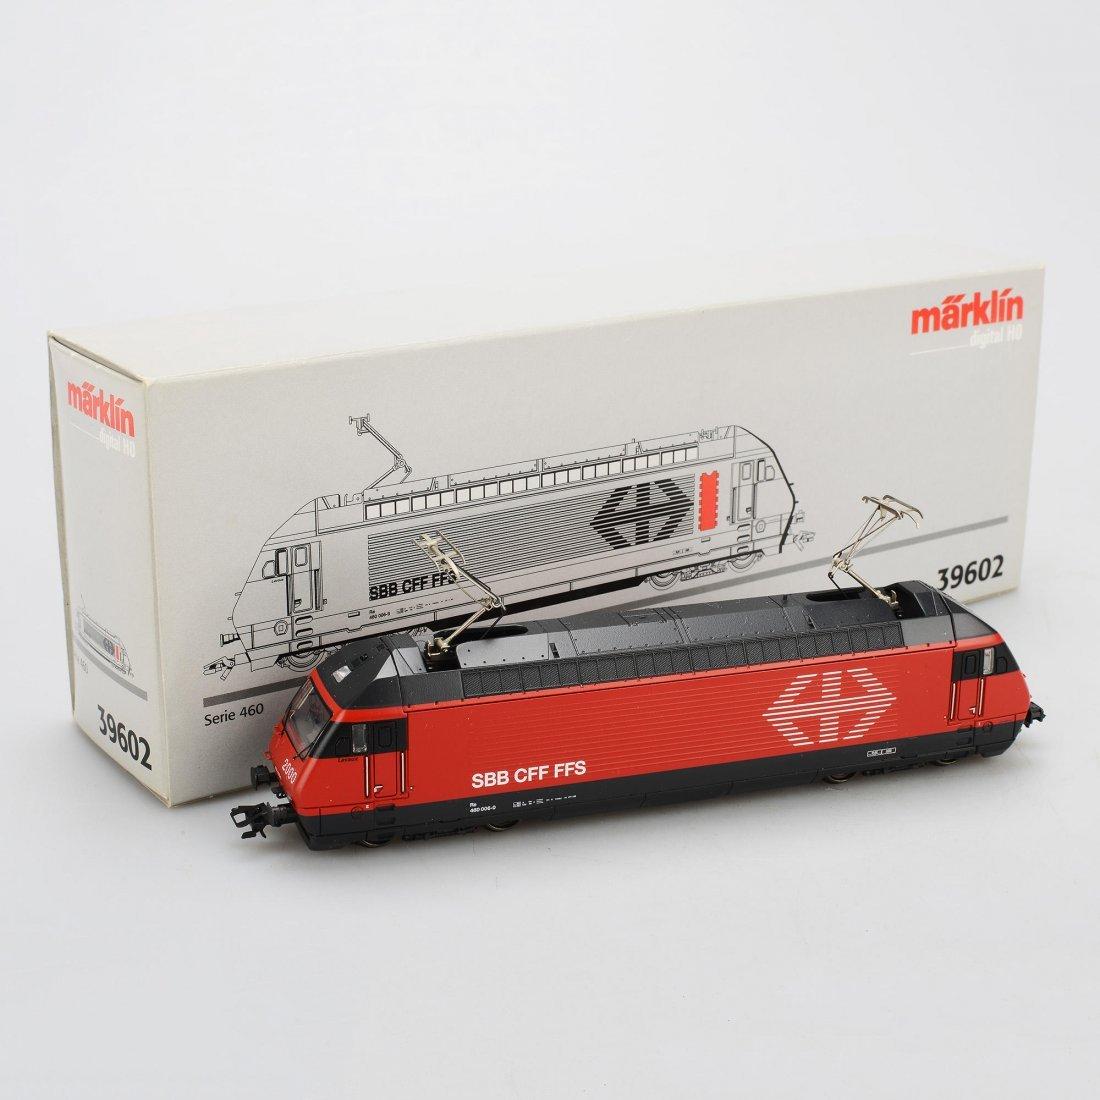 ELLOK, 39602, Marklin, Digital H0